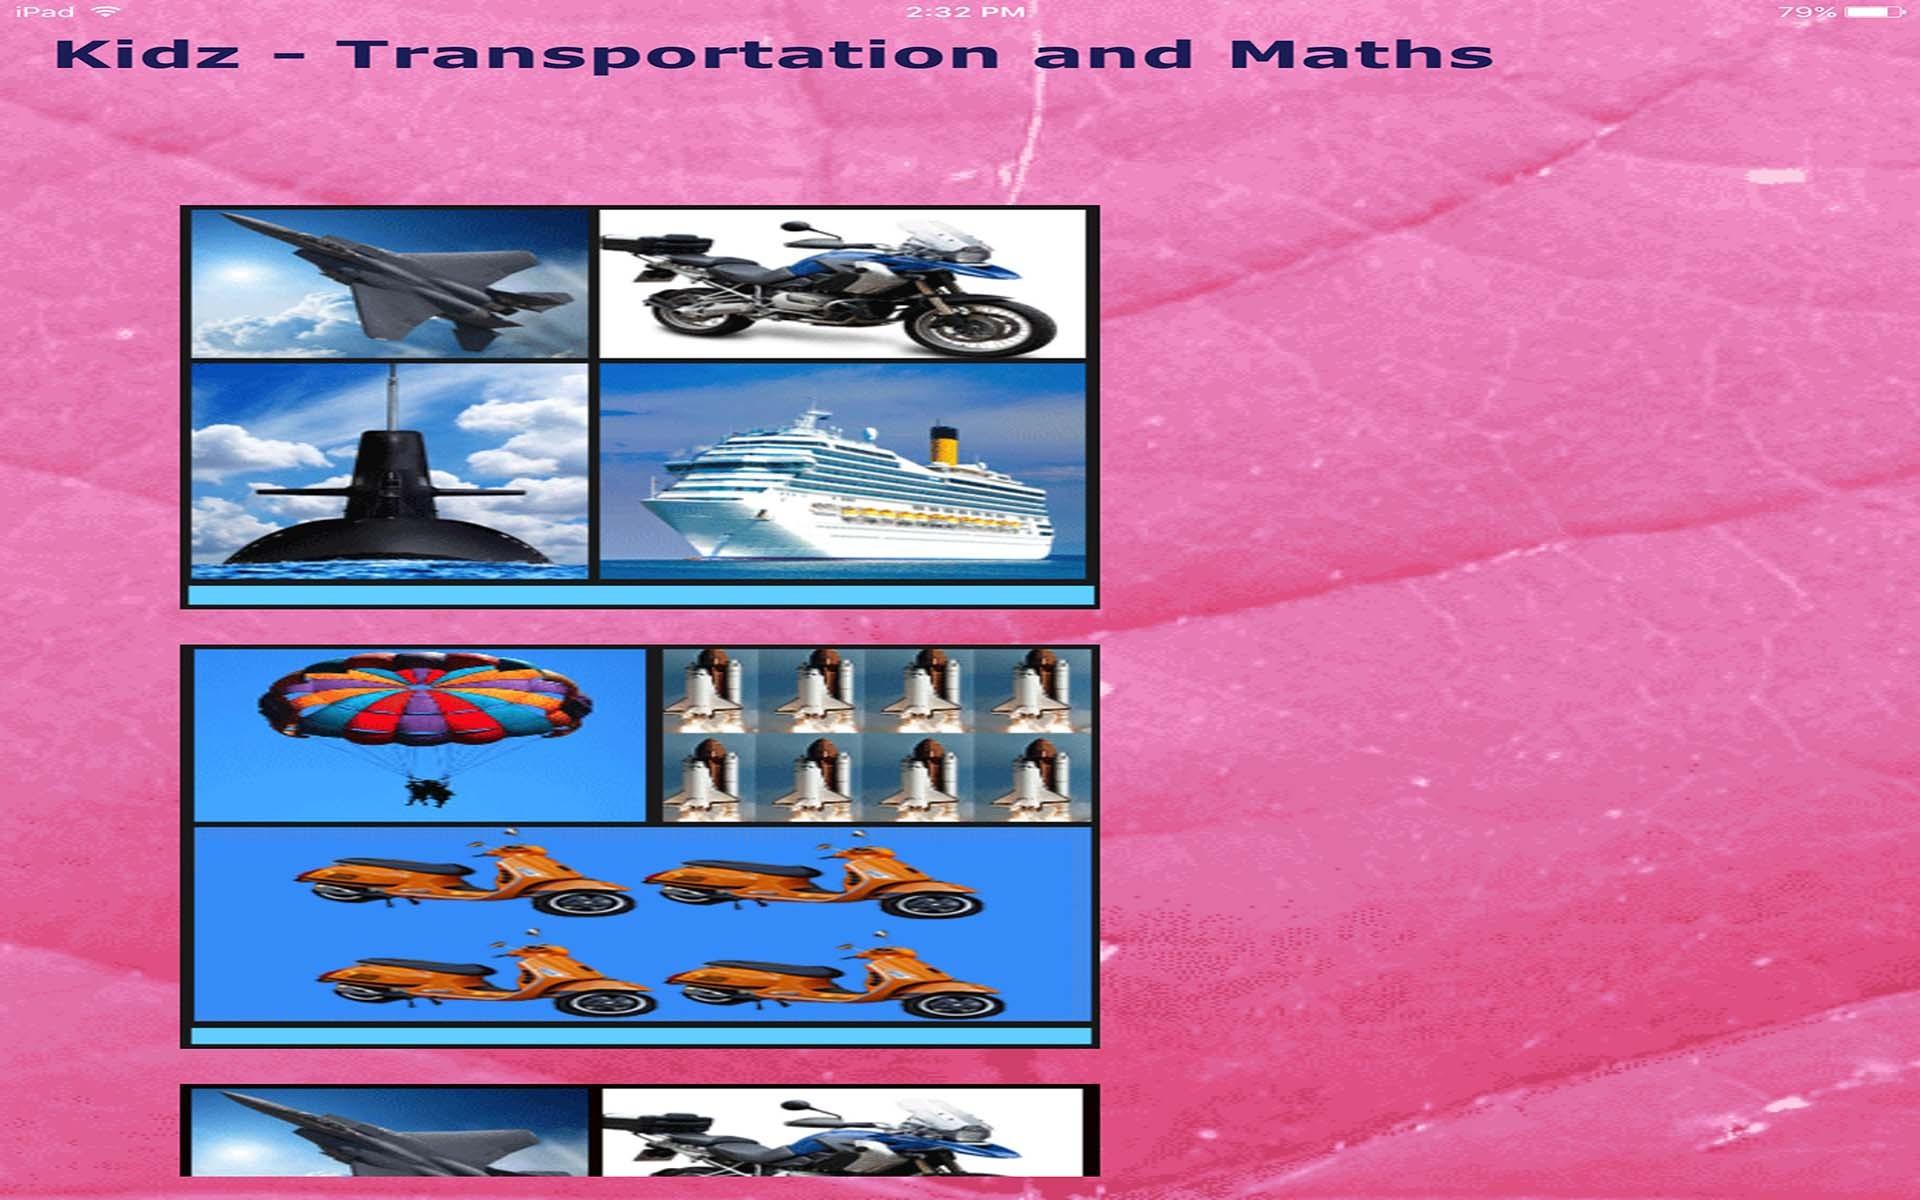 Kidz Learn Transportation